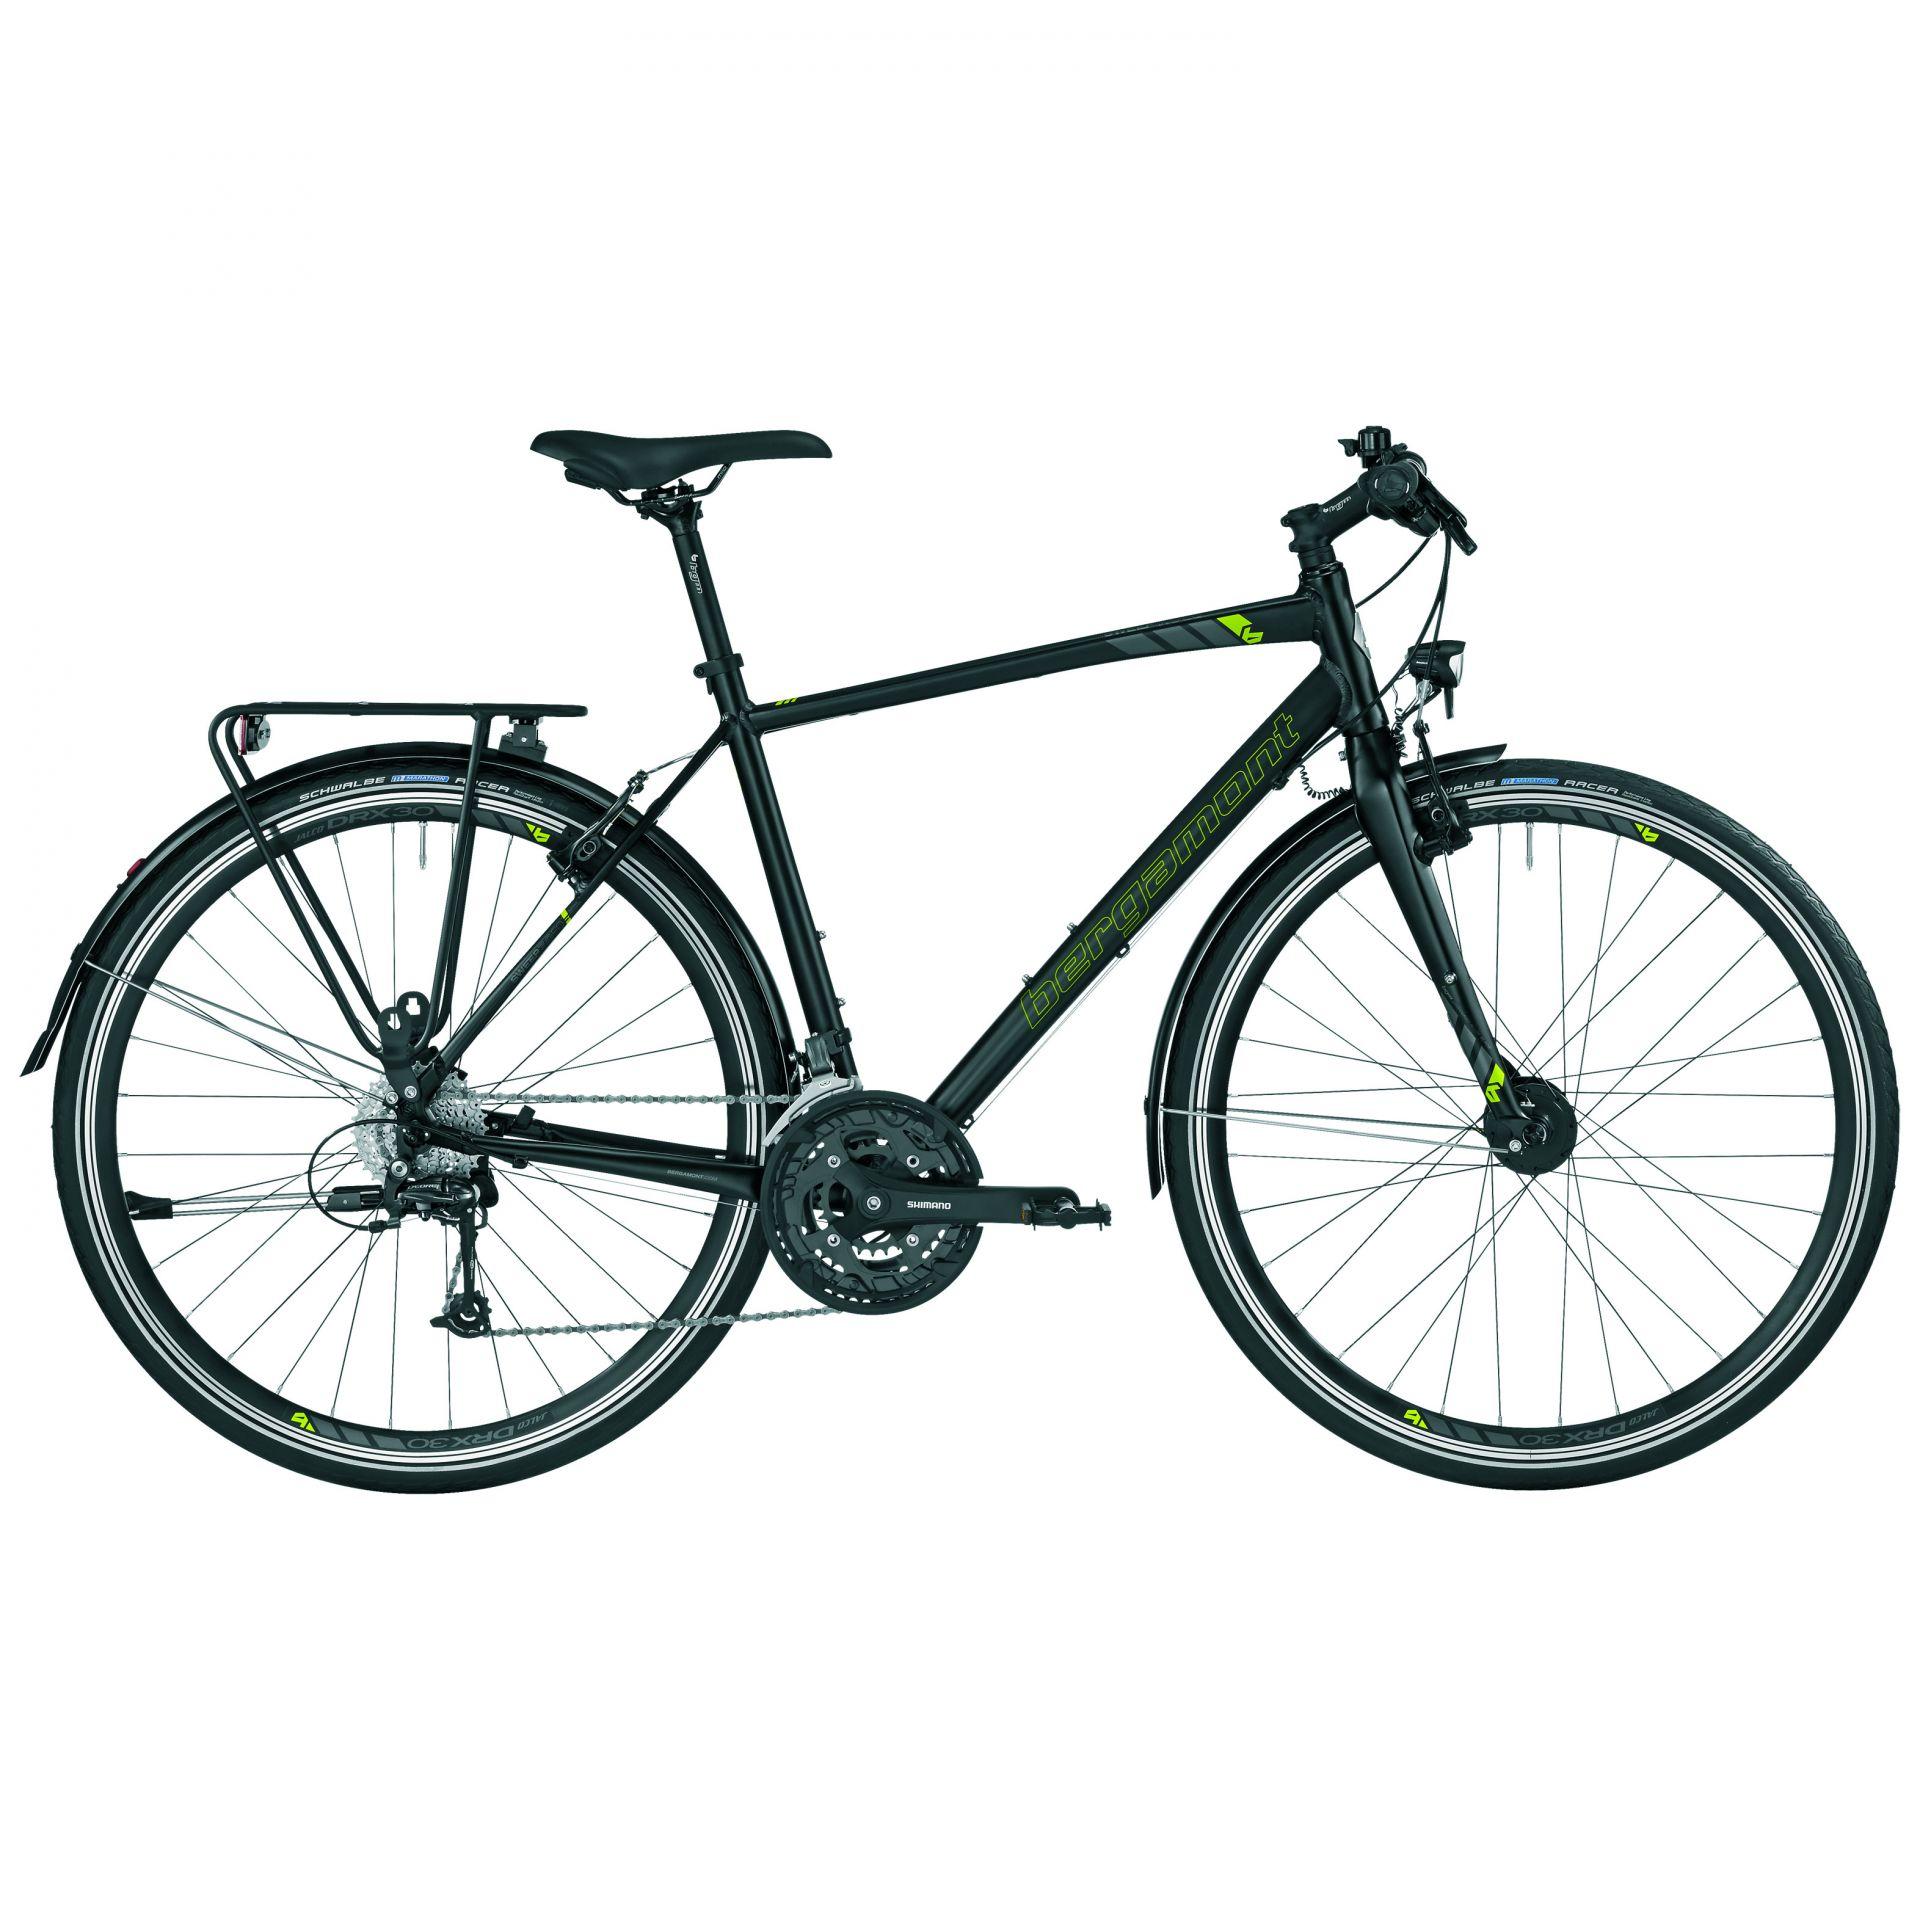 Vélo urbain/trekking Bergamont Sweep 7.0 EQ Gent Noir/Lime mat - 52 cm